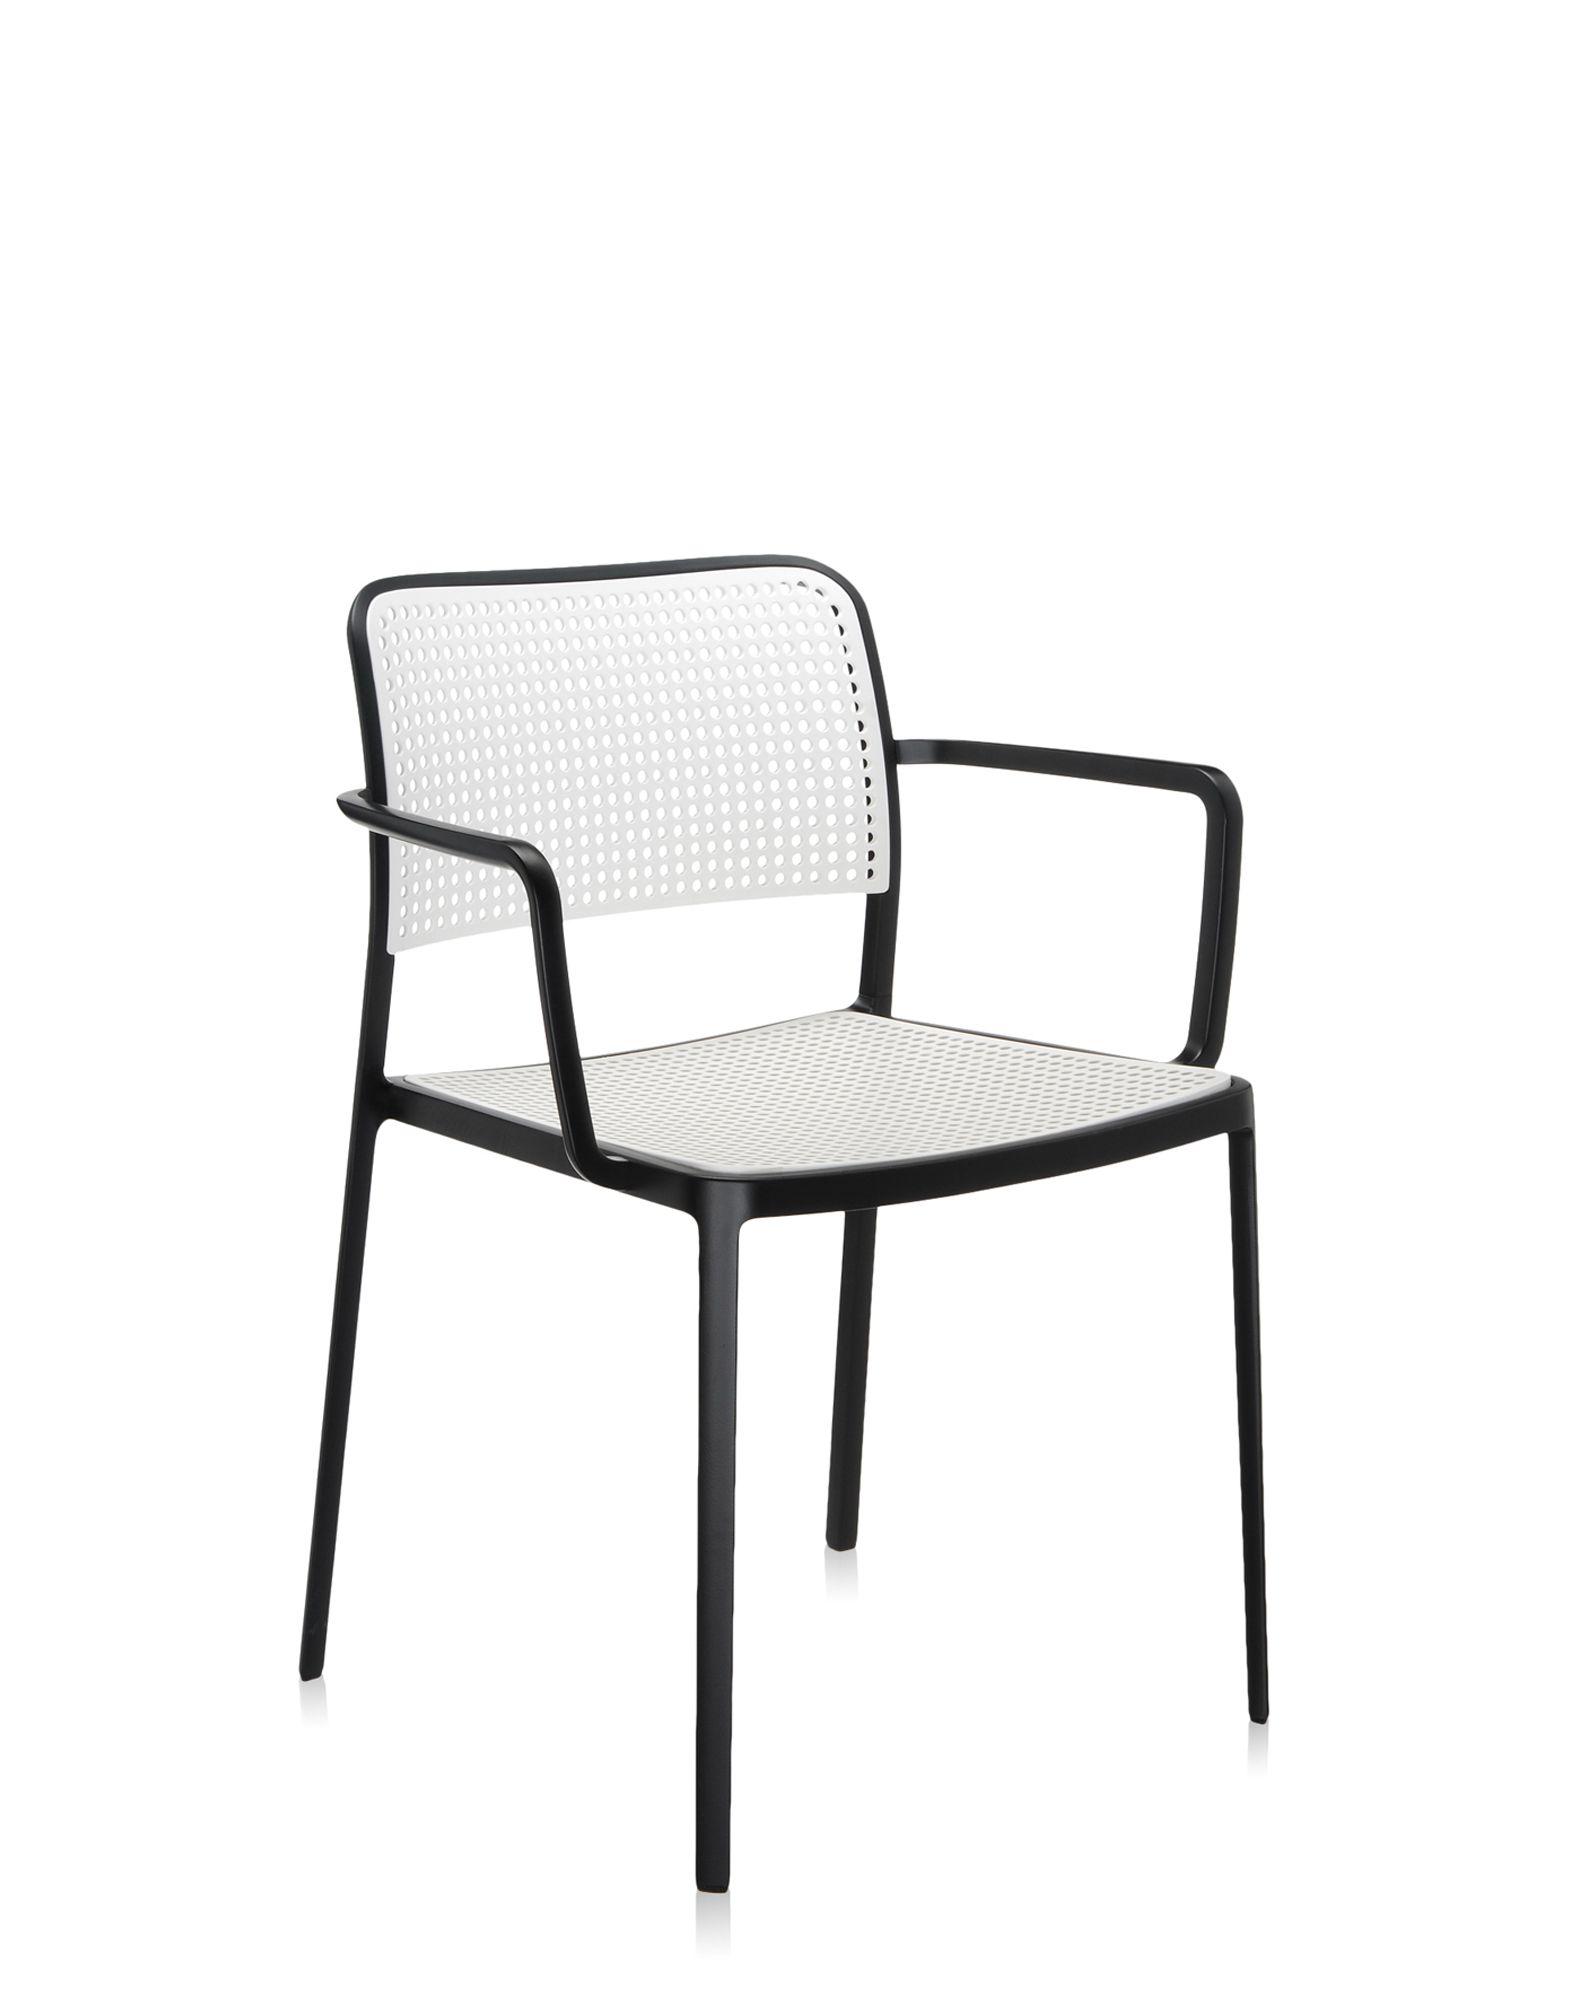 Kartell audrey bianco alluminio verniciato nero sedie for Sedie alluminio design